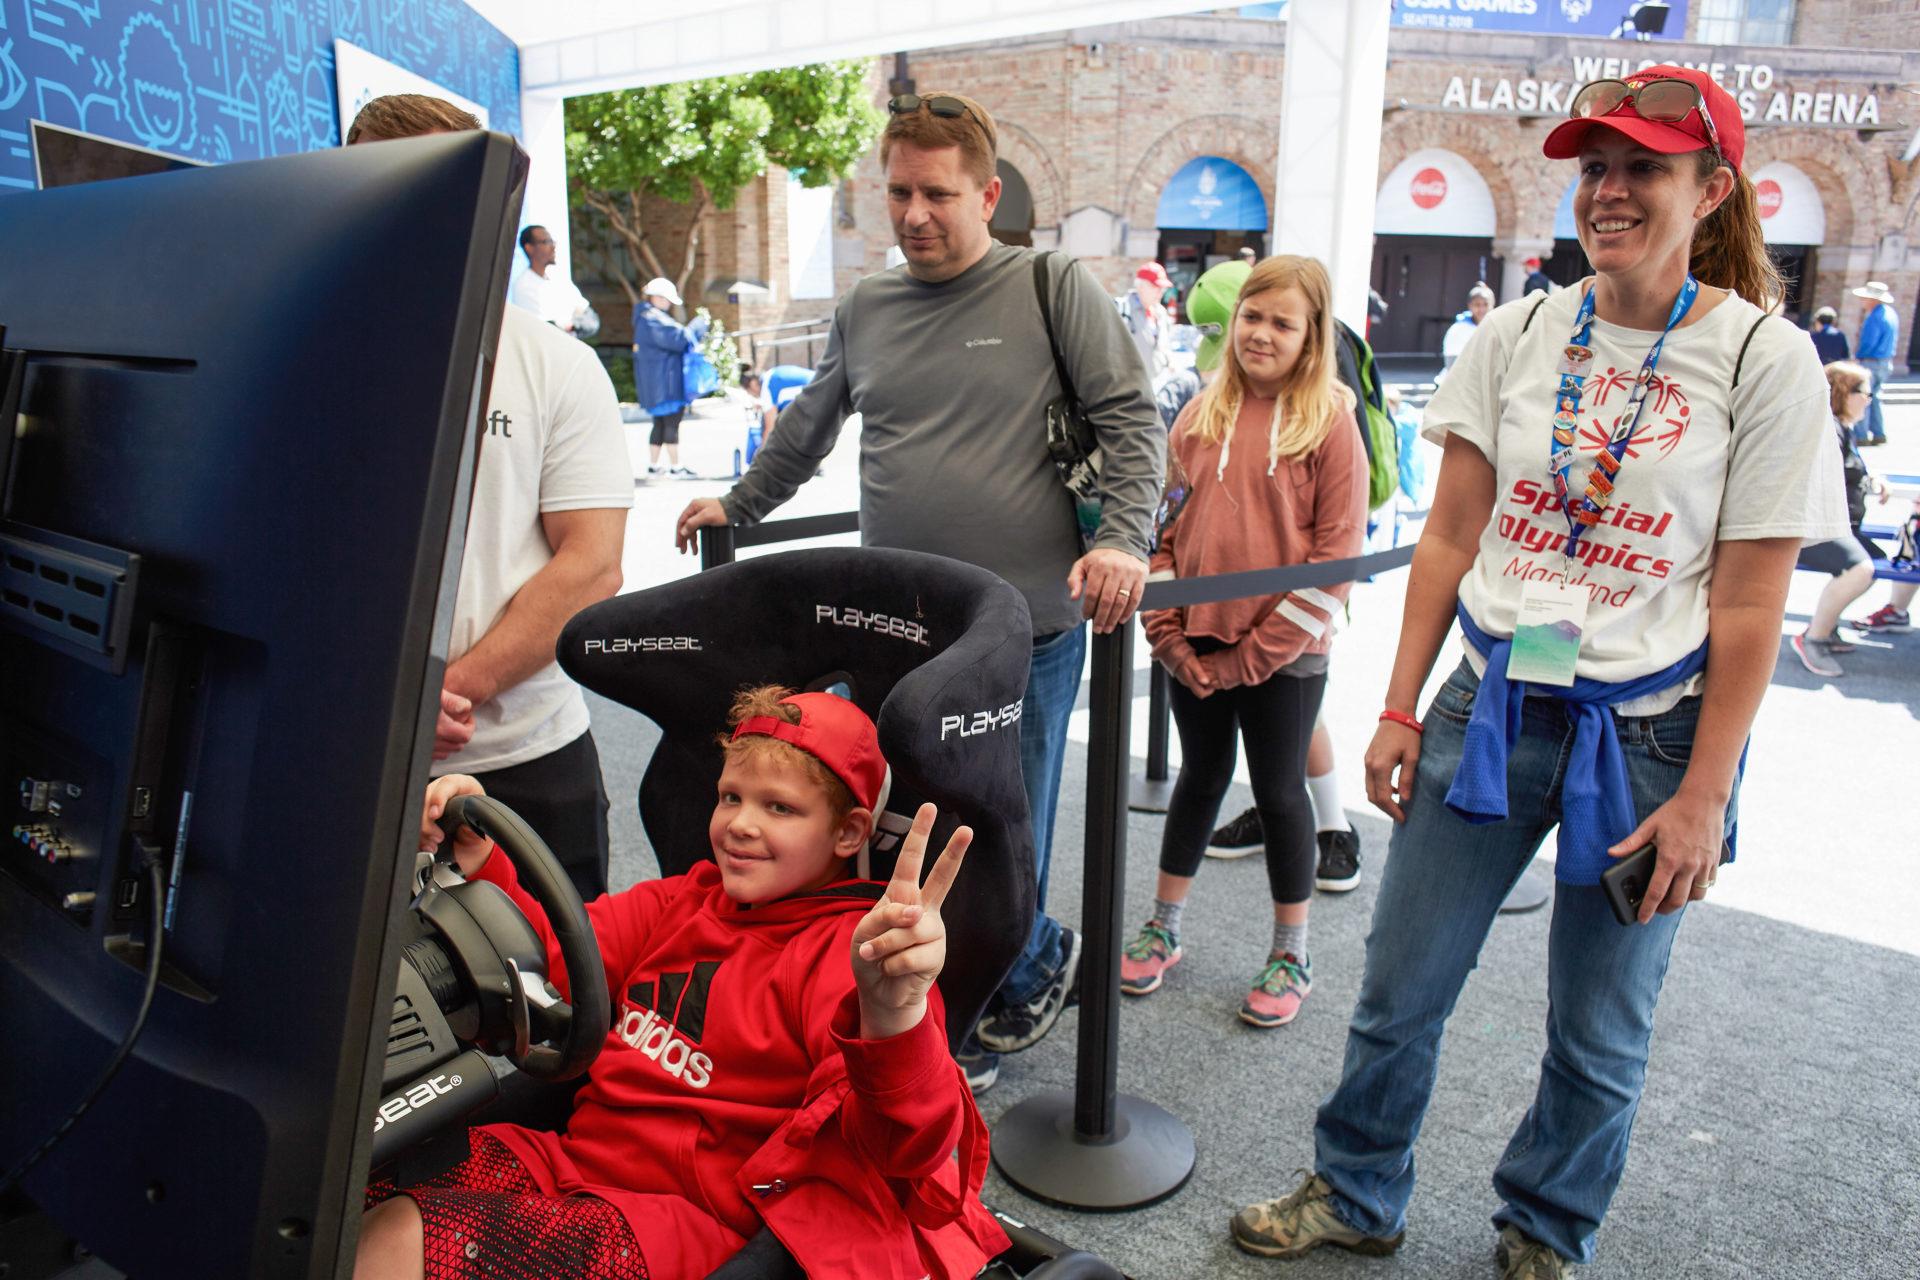 OHM-Microsoft-Special Olympics-Gaming-6990.jpg